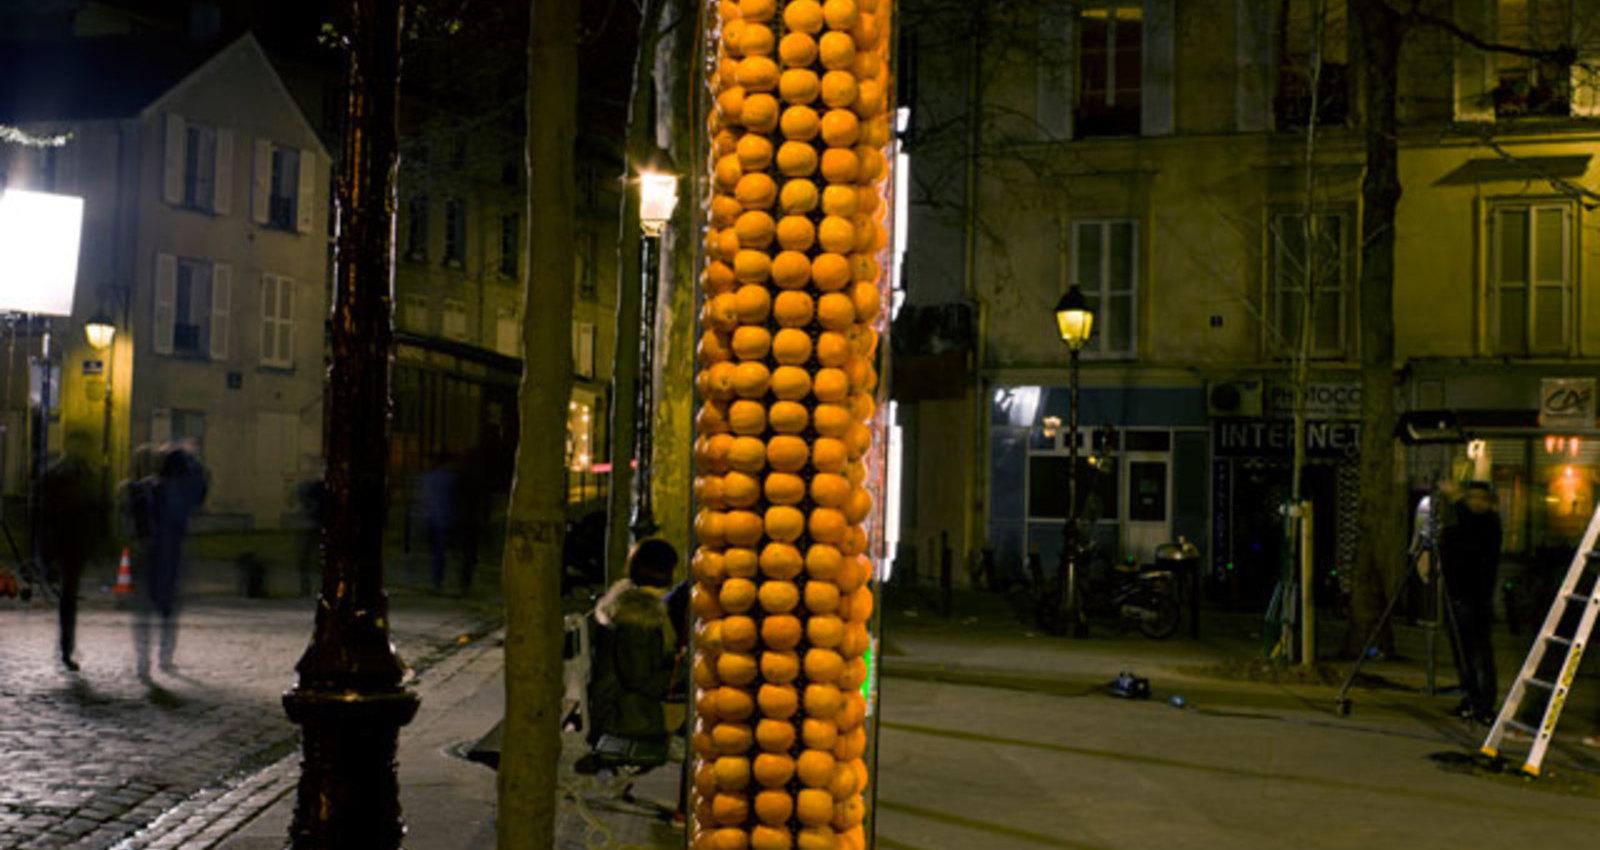 Billboard powered by oranges